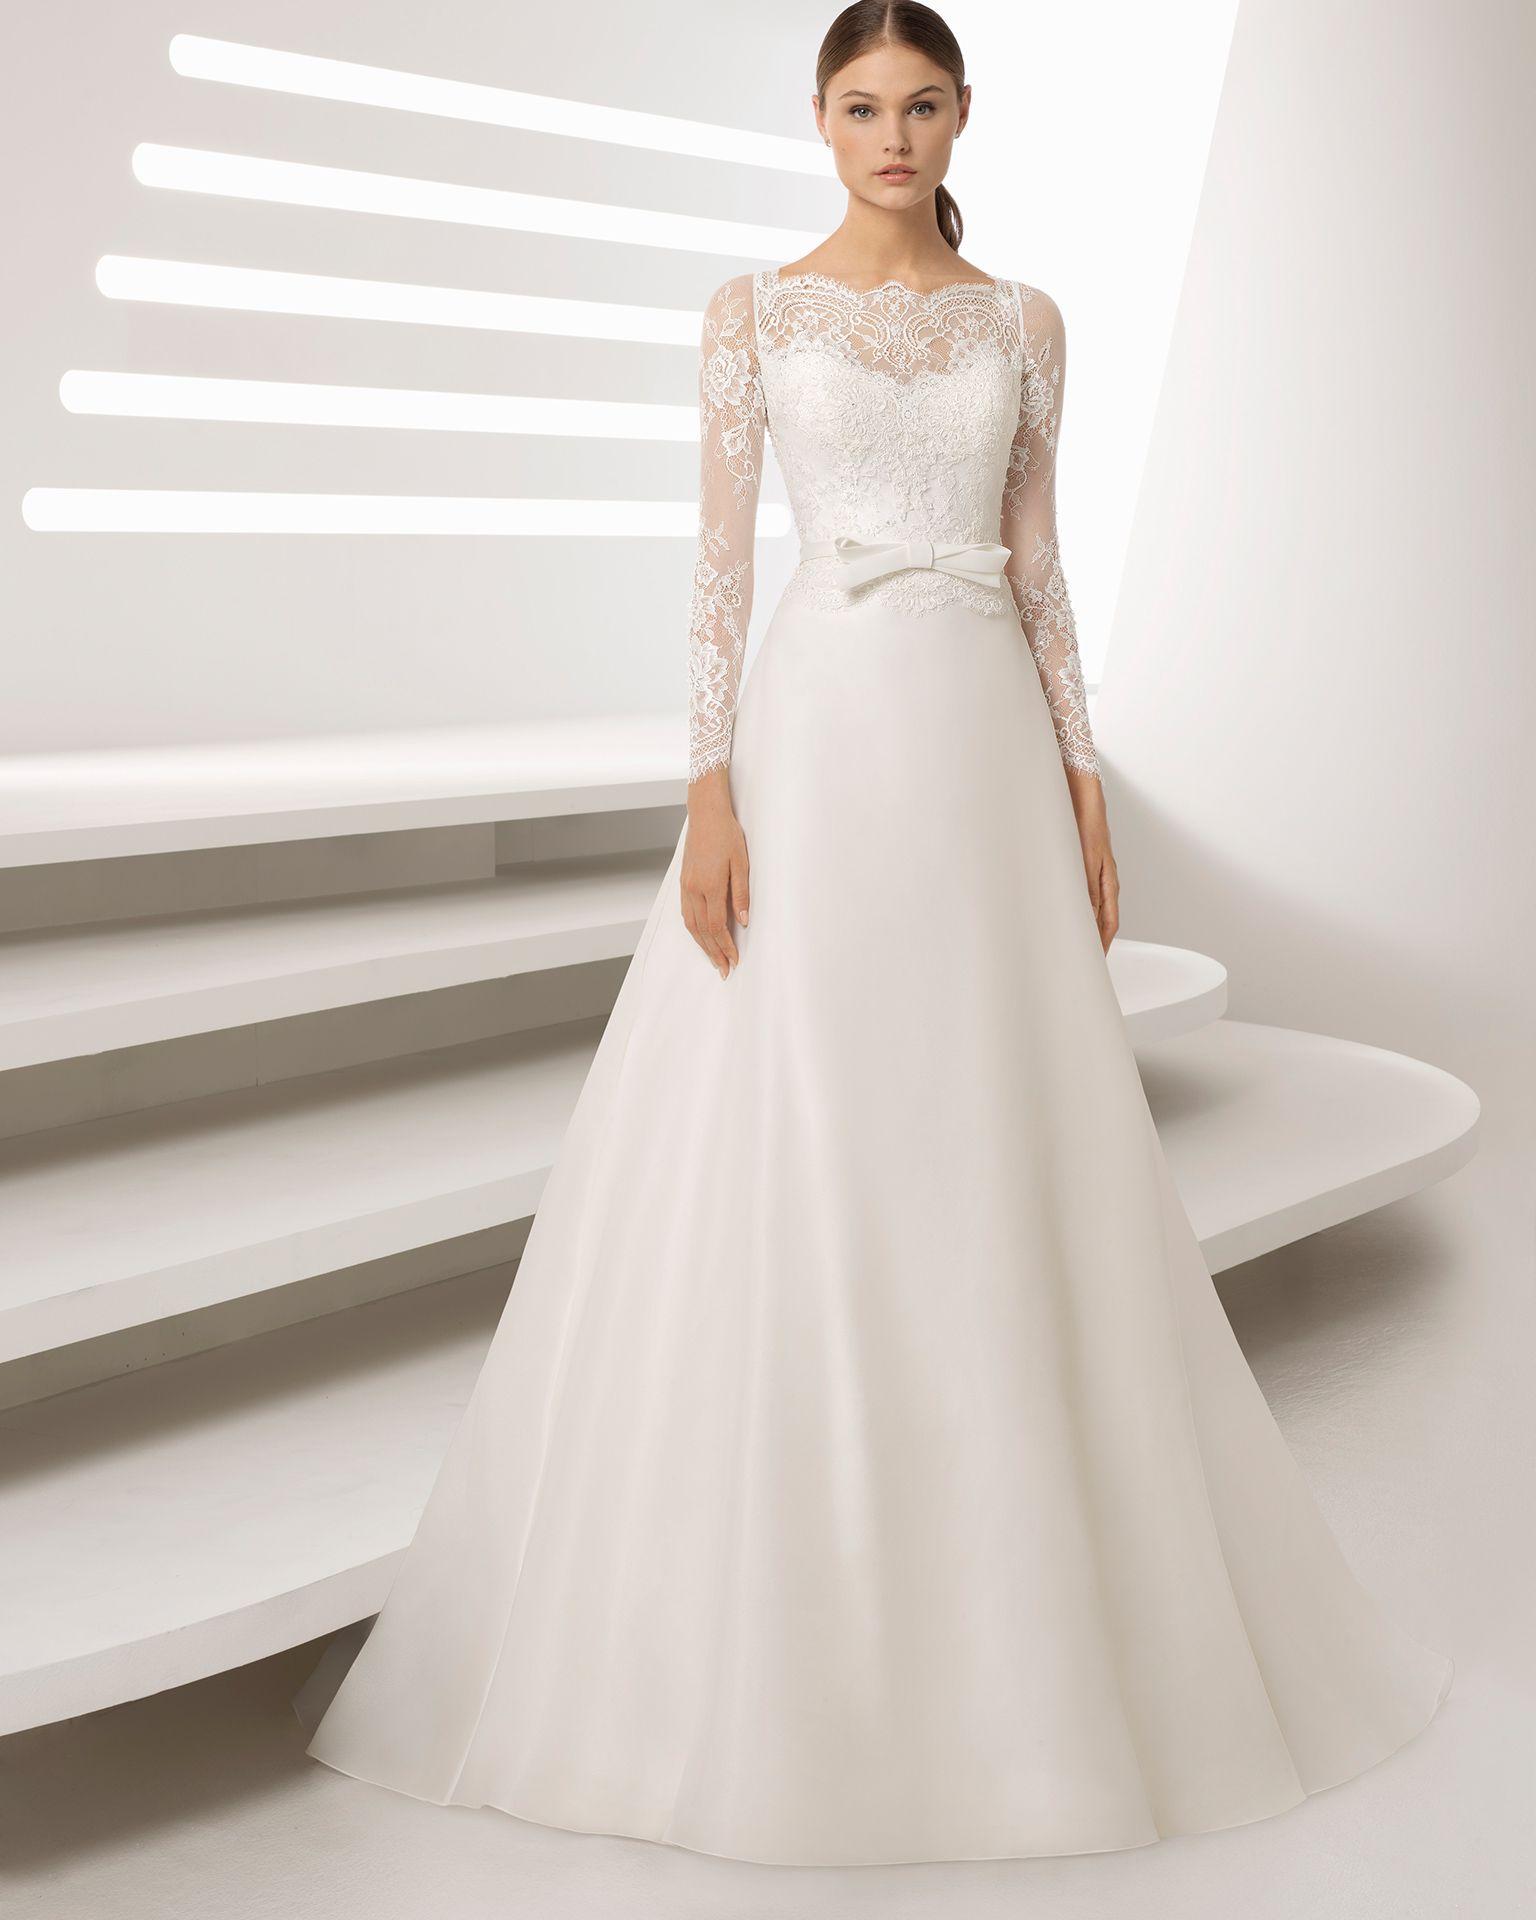 ANTIFAZ - sposa 2018. Collezione Rosa Clará | Pinterest ...